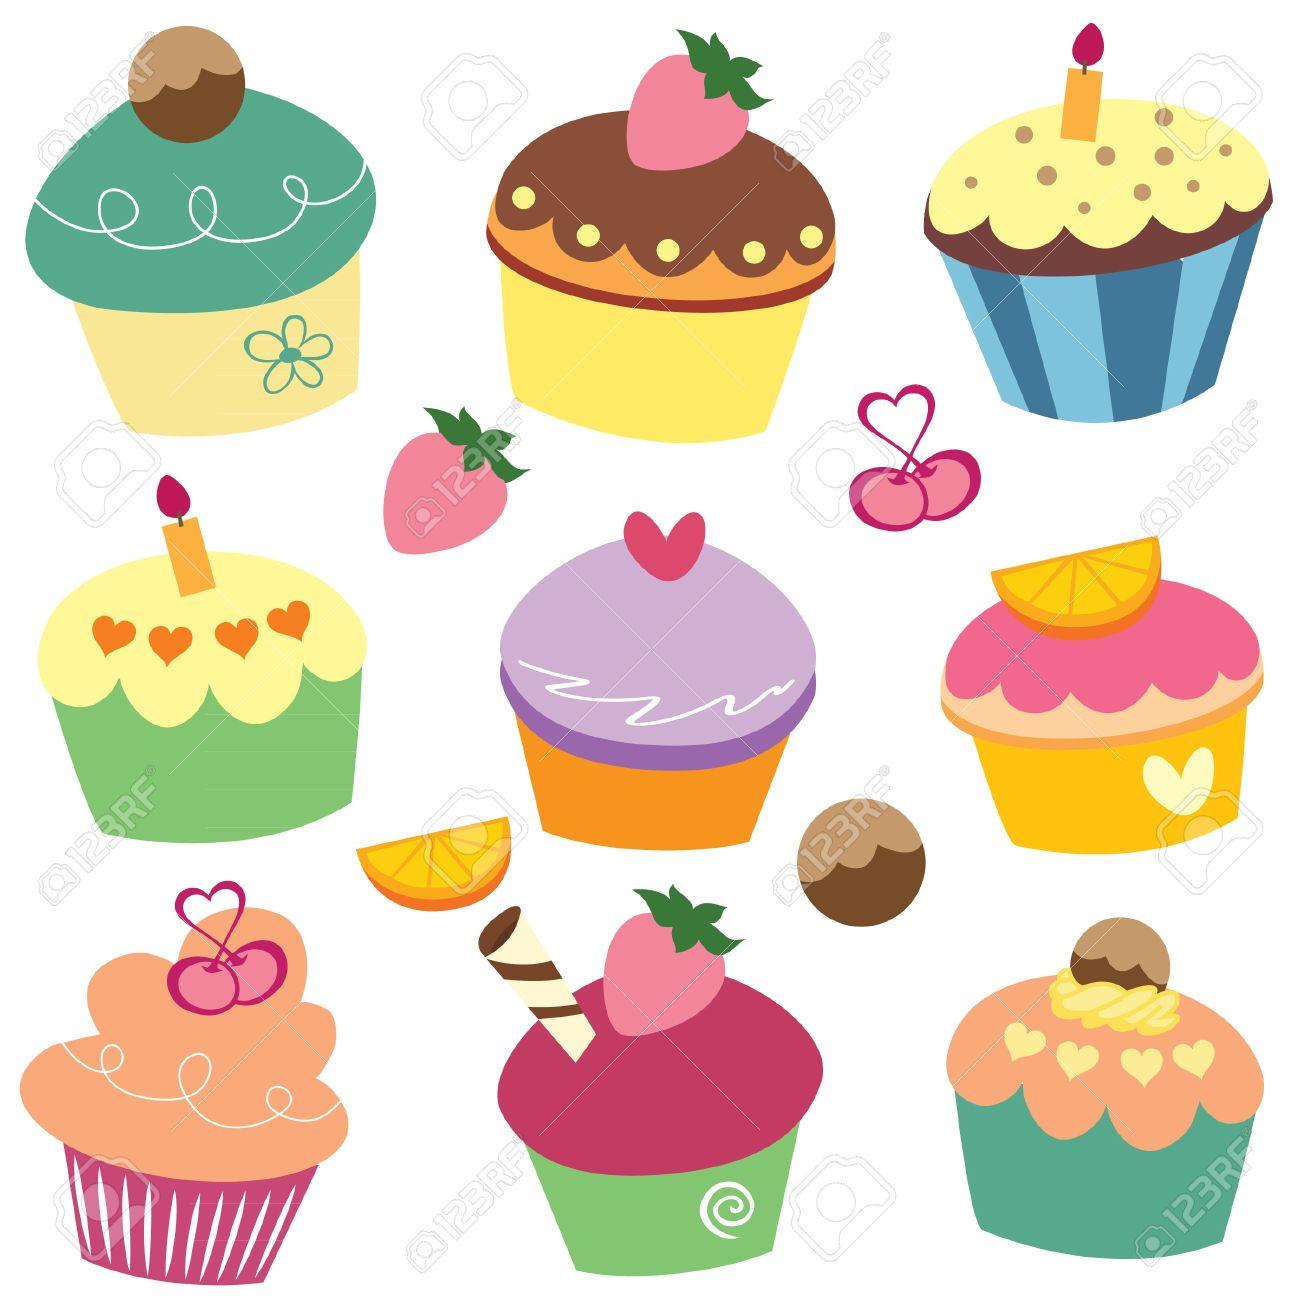 yummy cupcakes clip art.